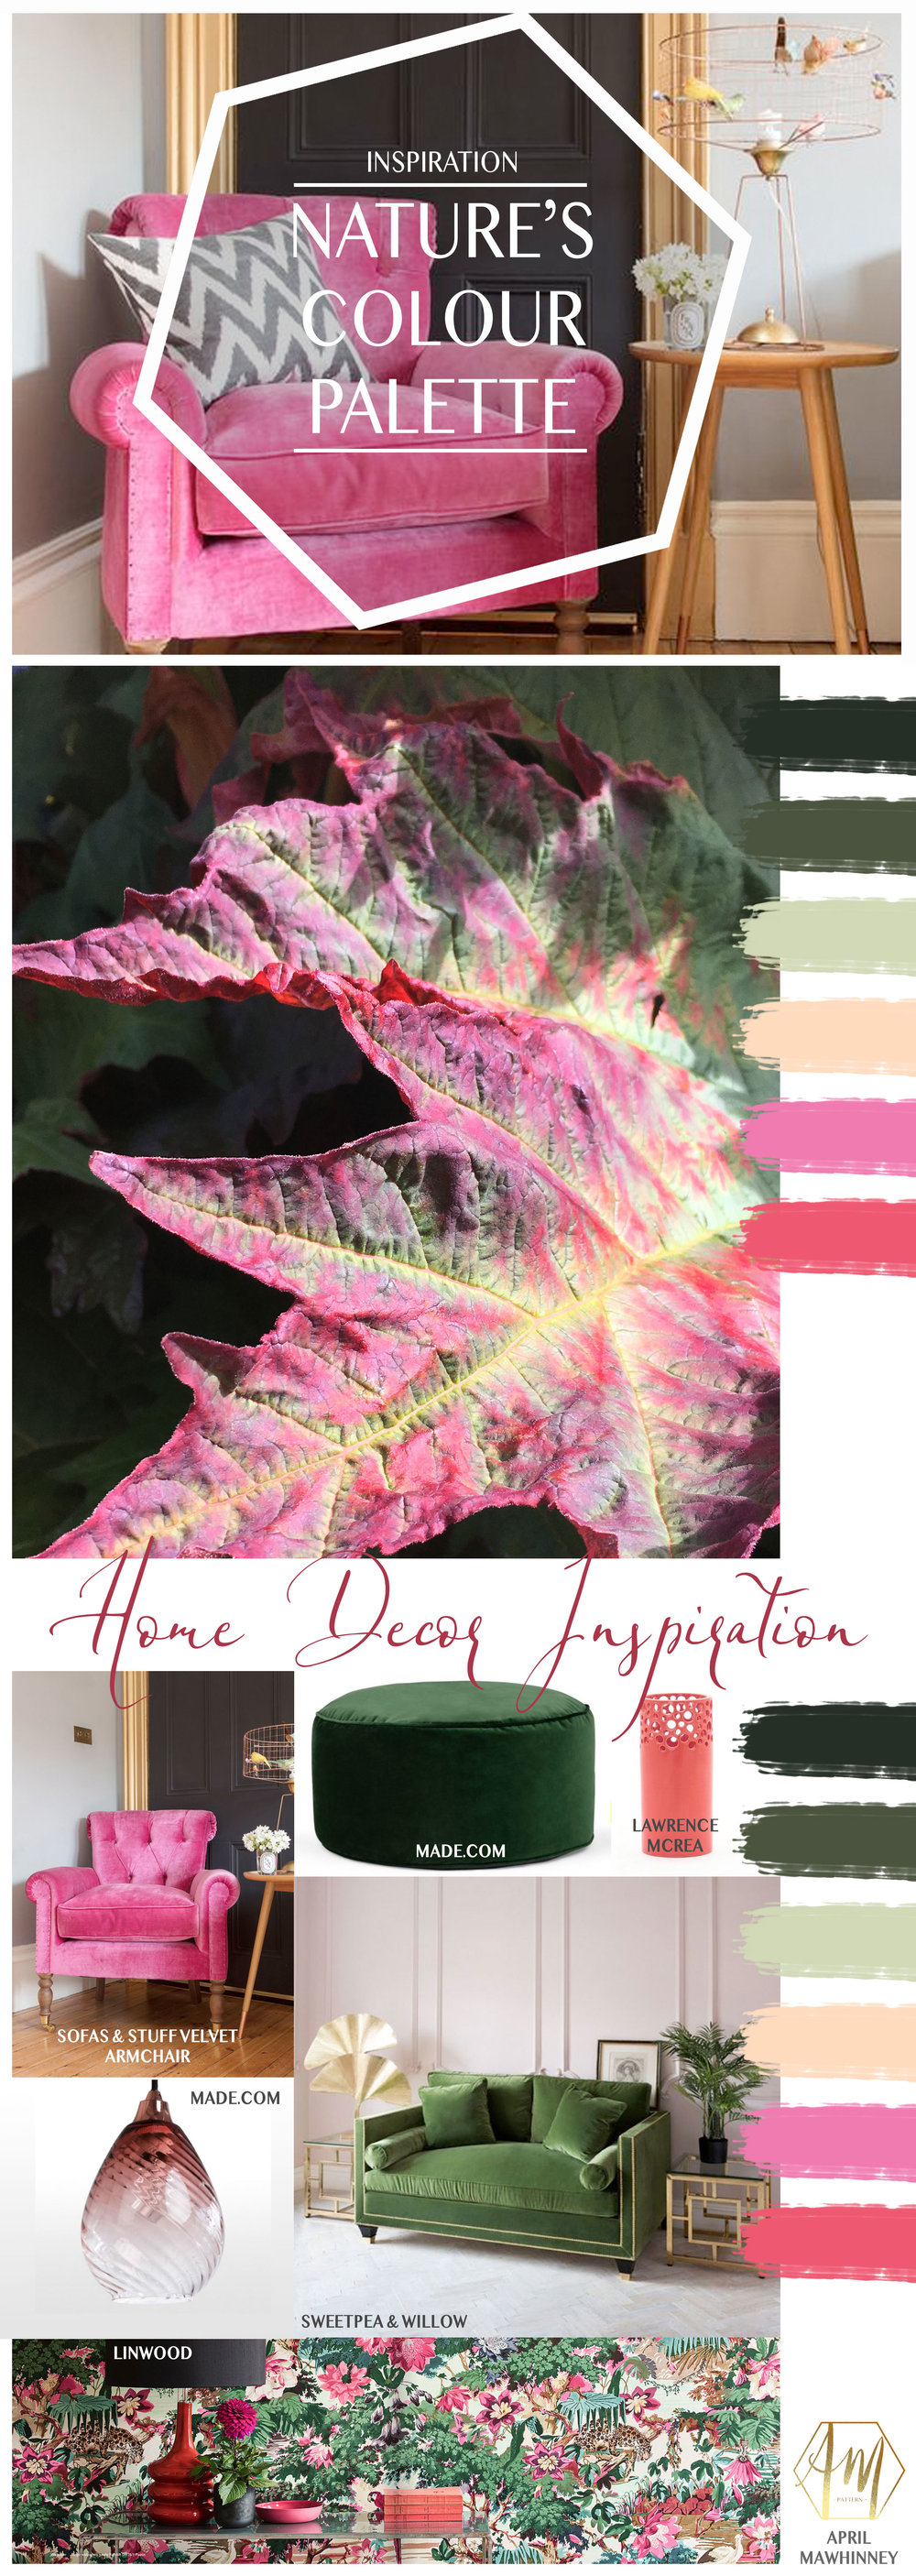 Nature's Colour Palette Inspiration for Home Decor | Interior design | Textile Design | Surface Pattern Design | April Mawhinnney Design Studio